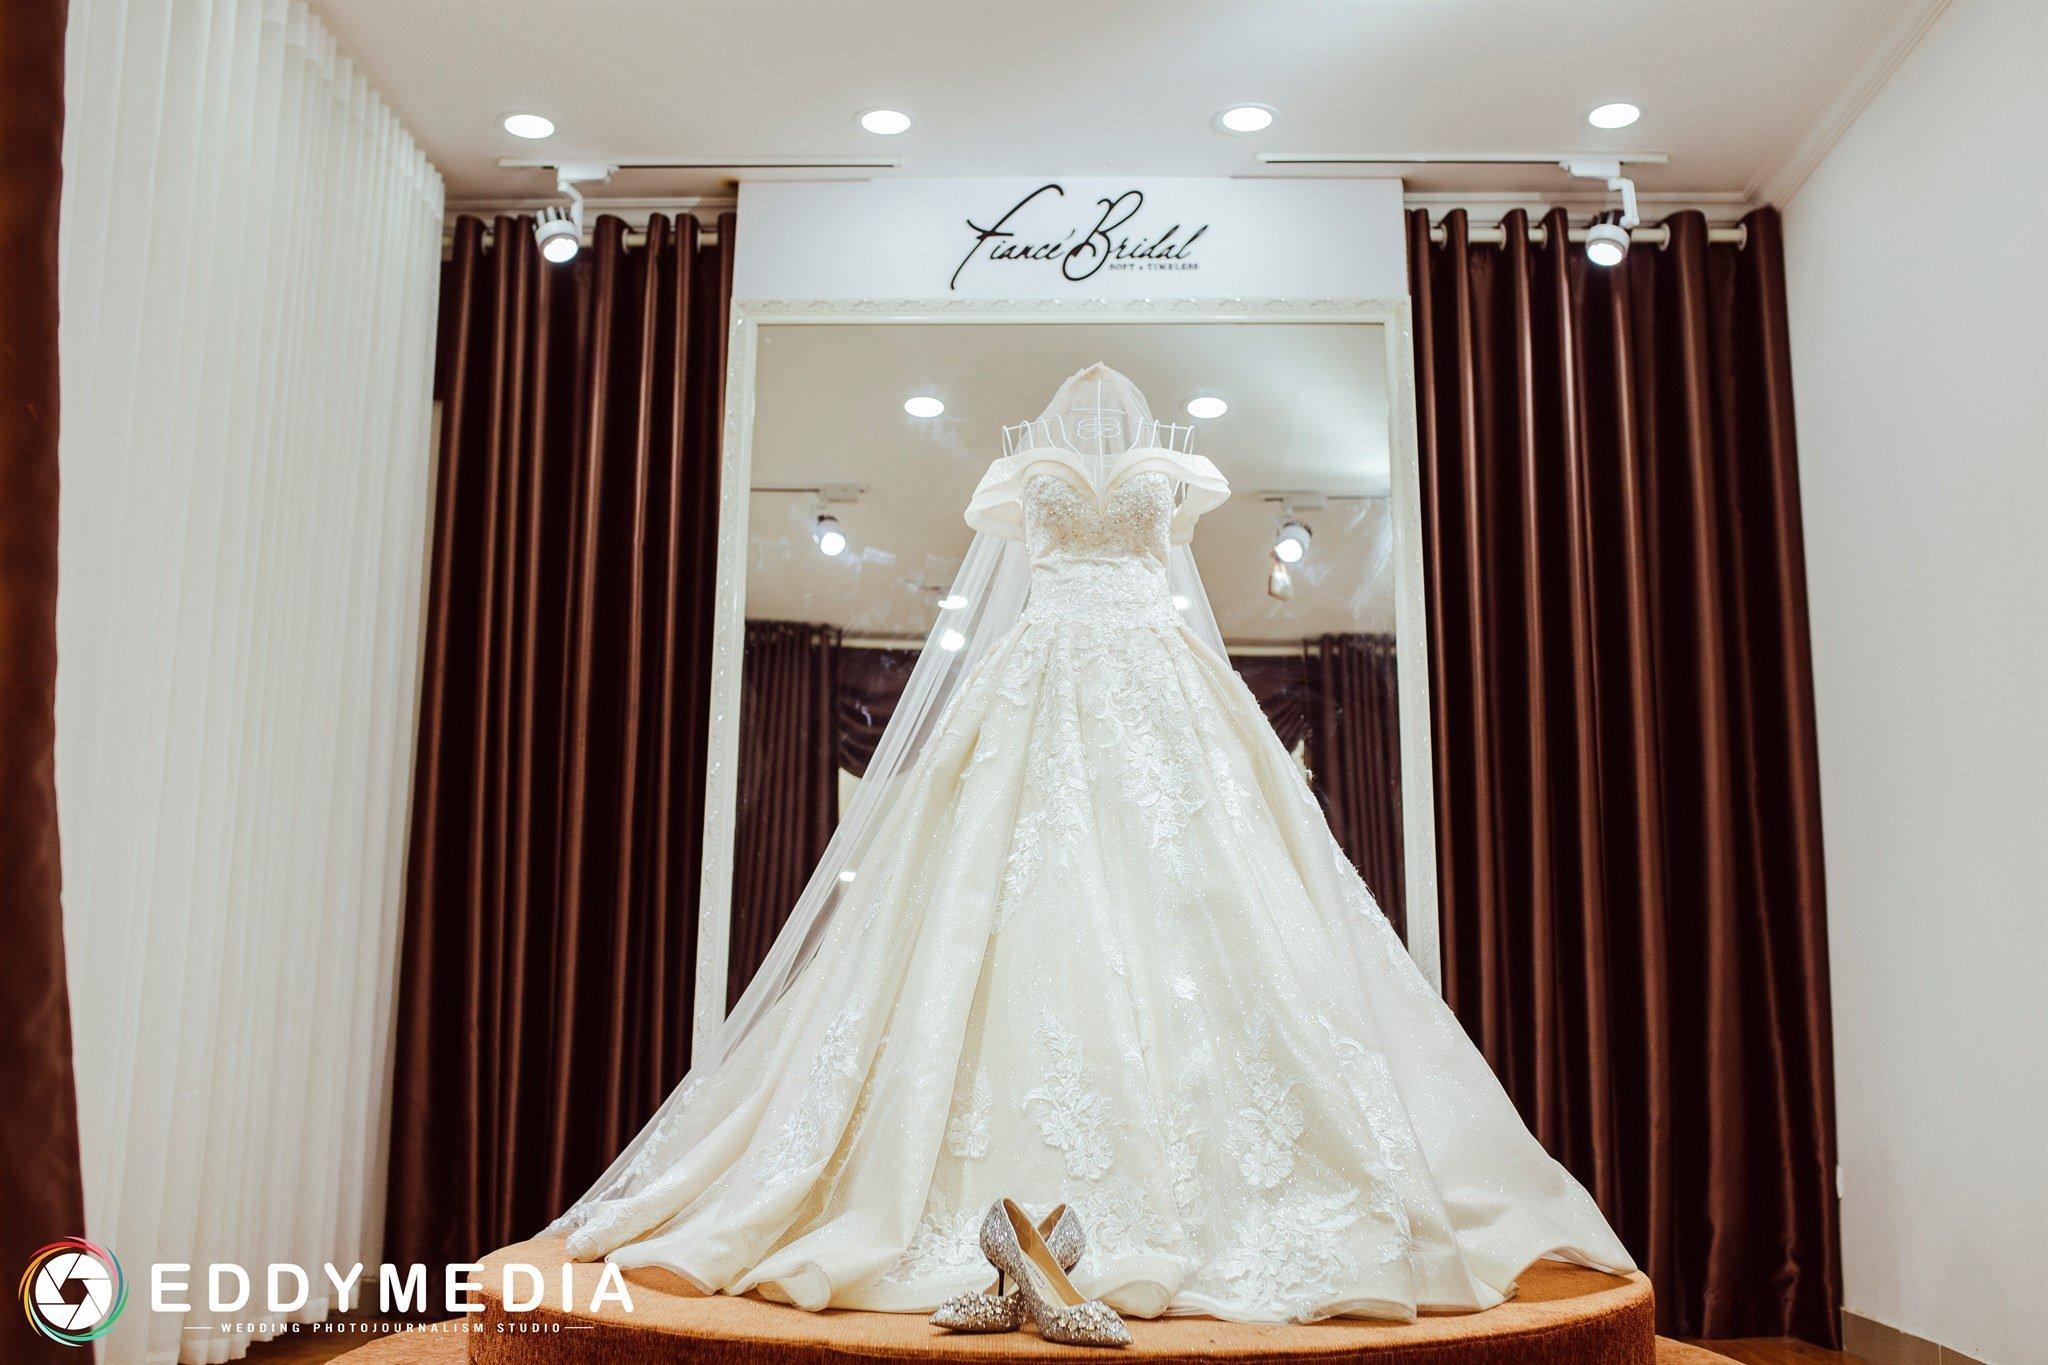 Phongsucuoi-MinhThang-MinhHoai-EddyMedia (19)